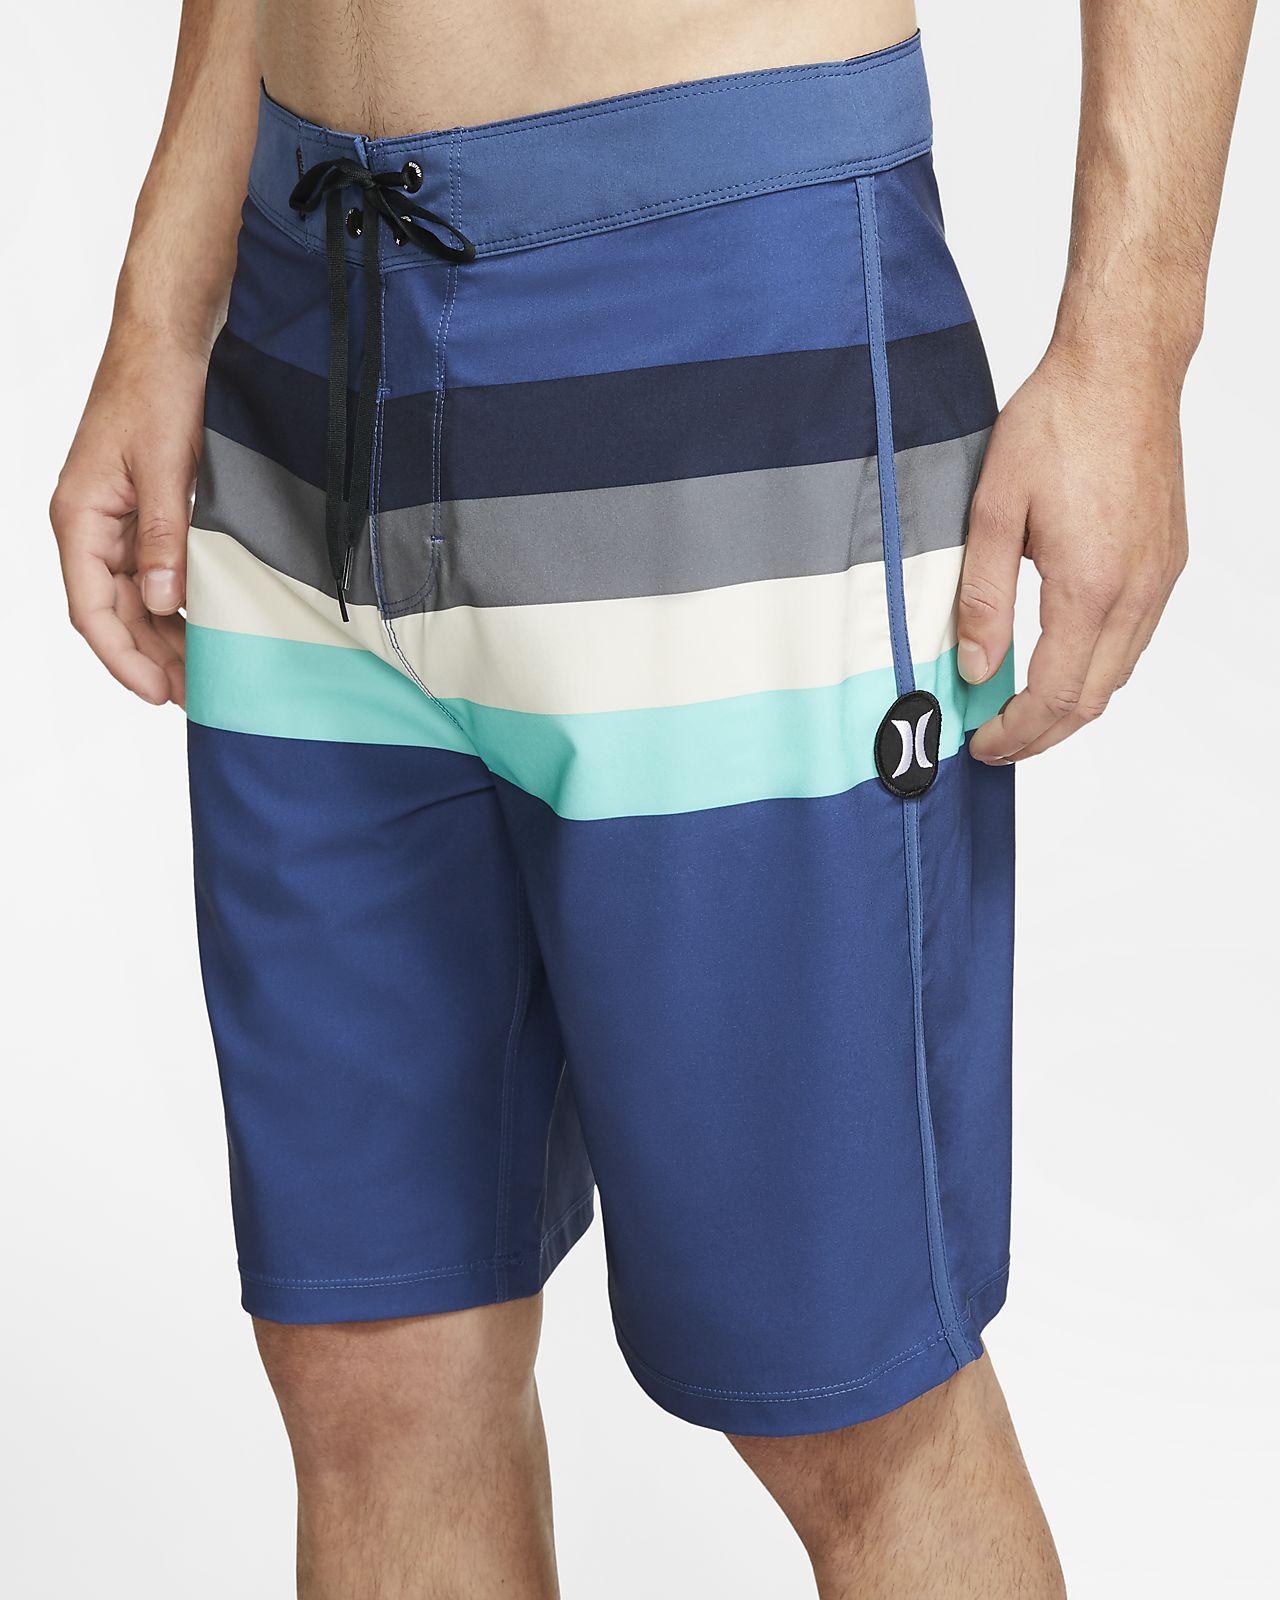 Shorts de playa de 51 cm para hombre Hurley Phantom Jetties